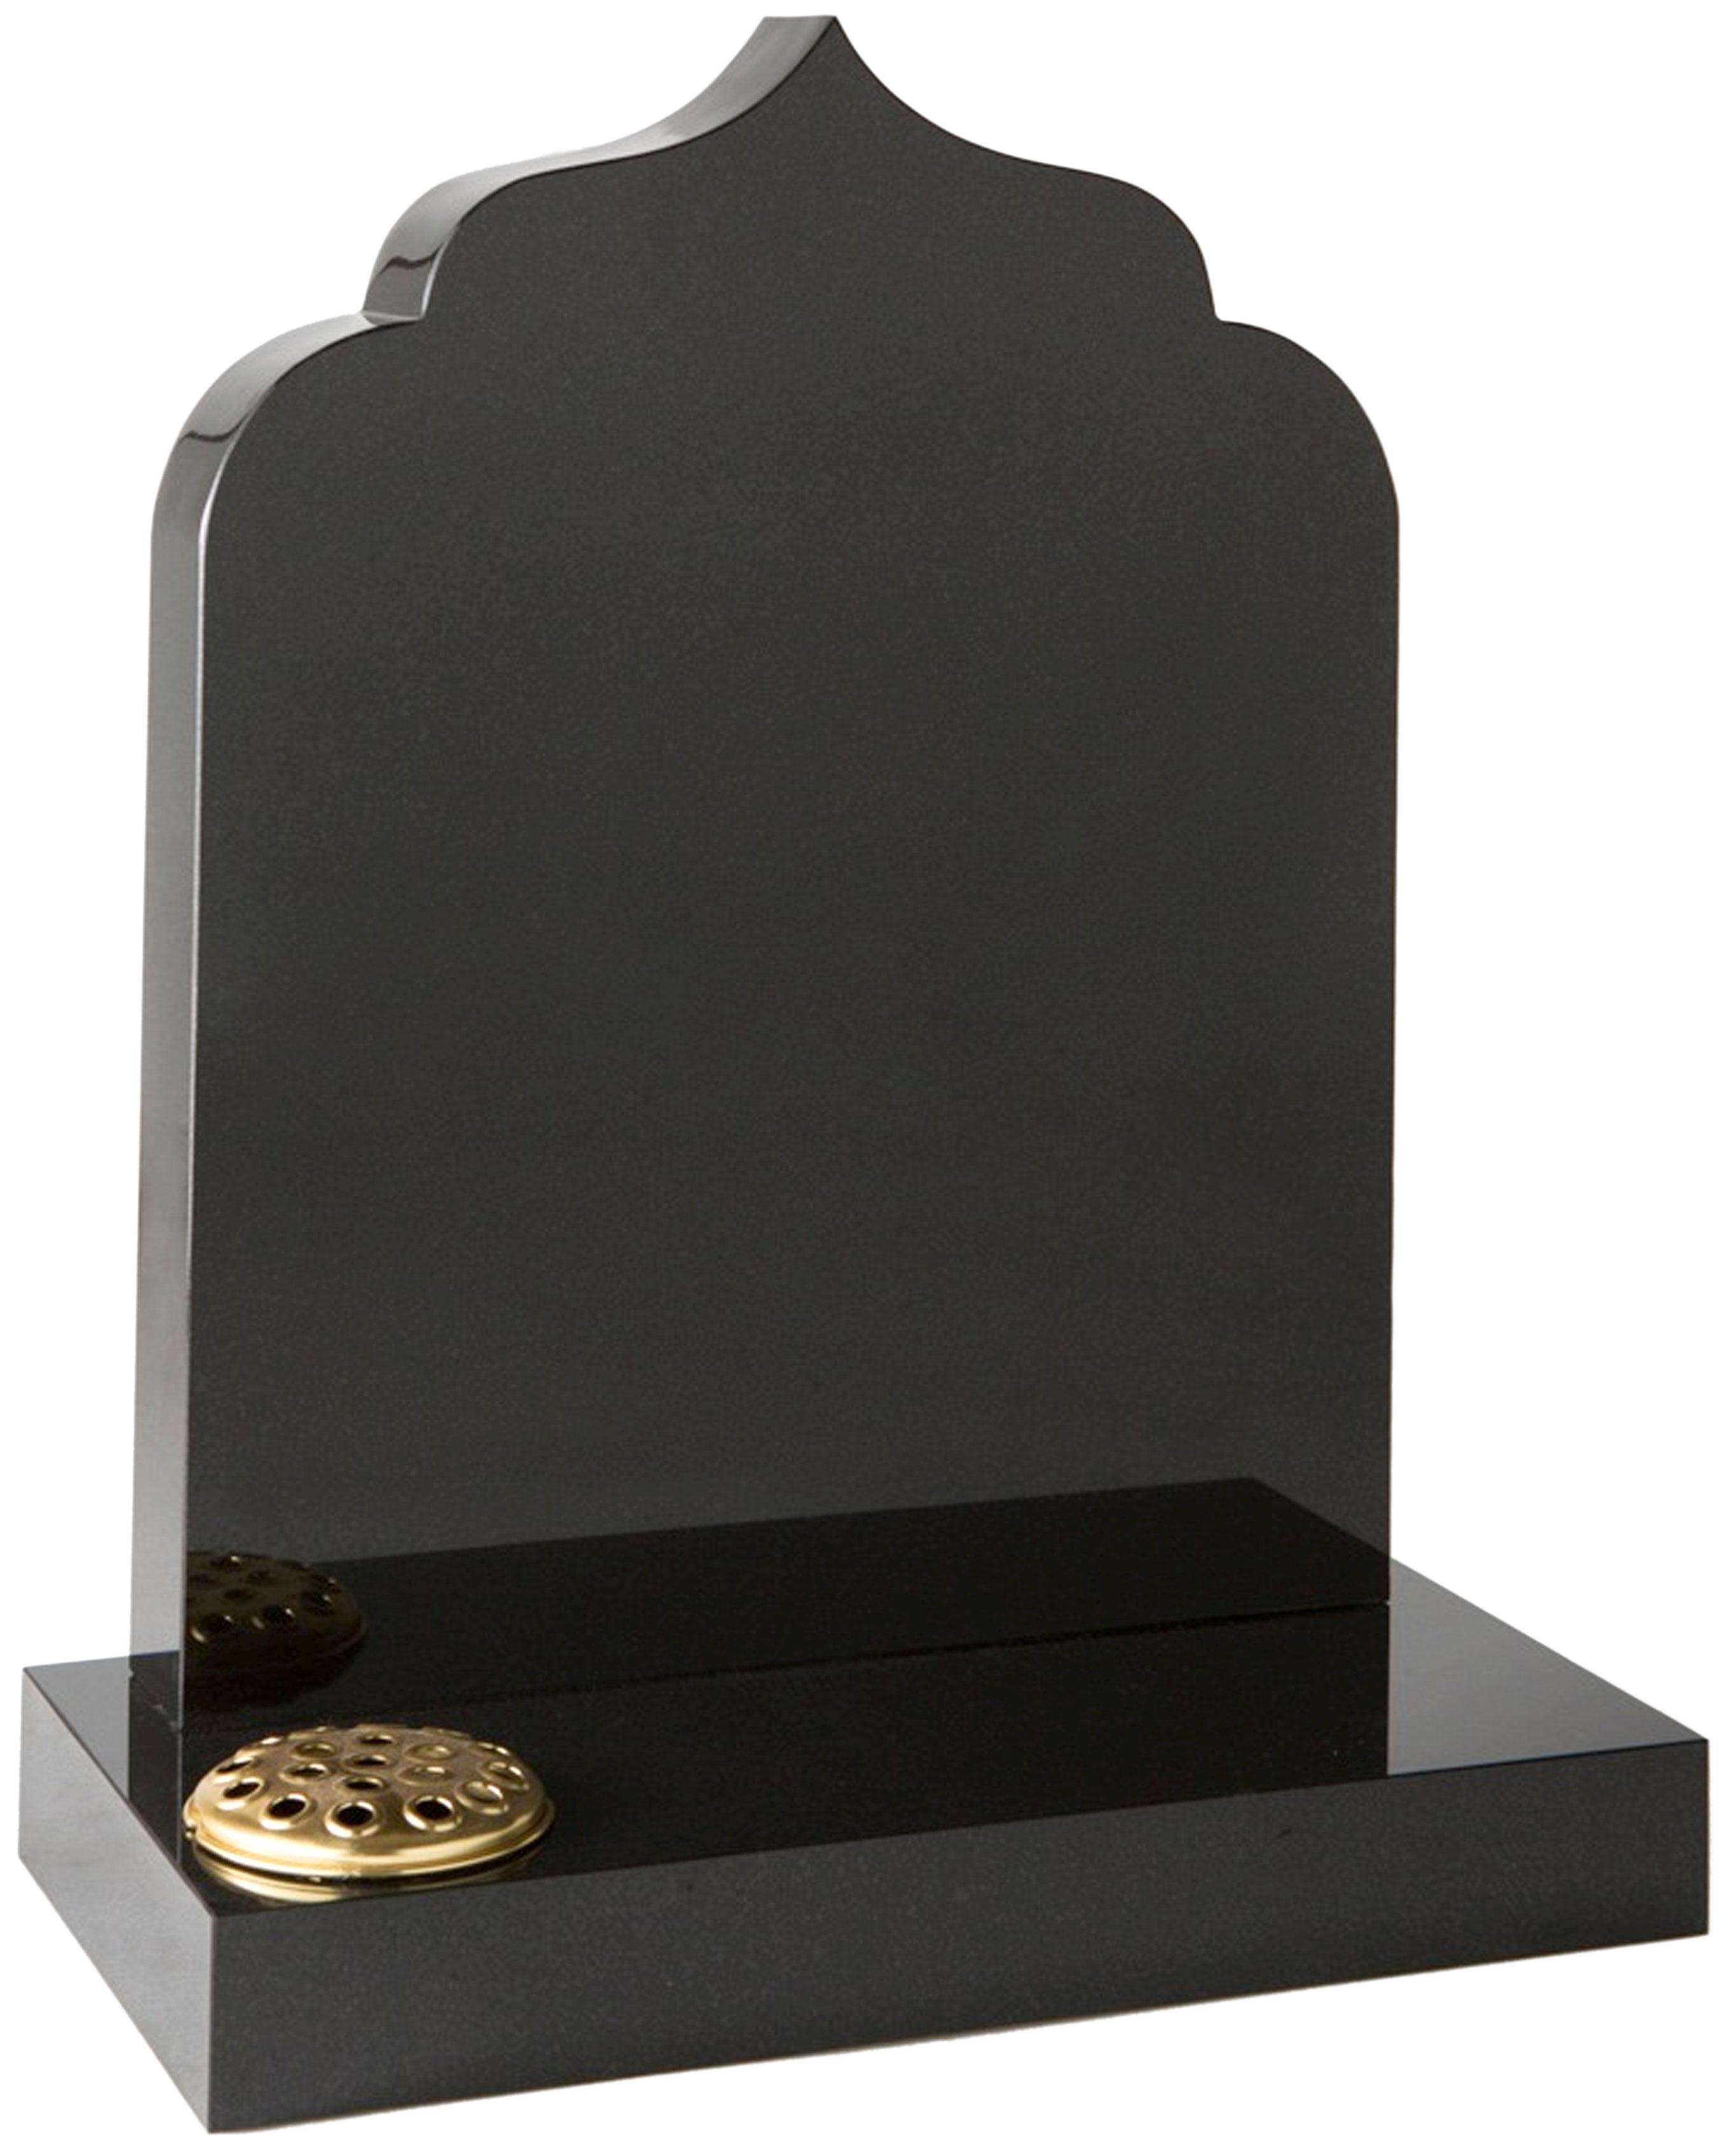 16150 Inspired headstone